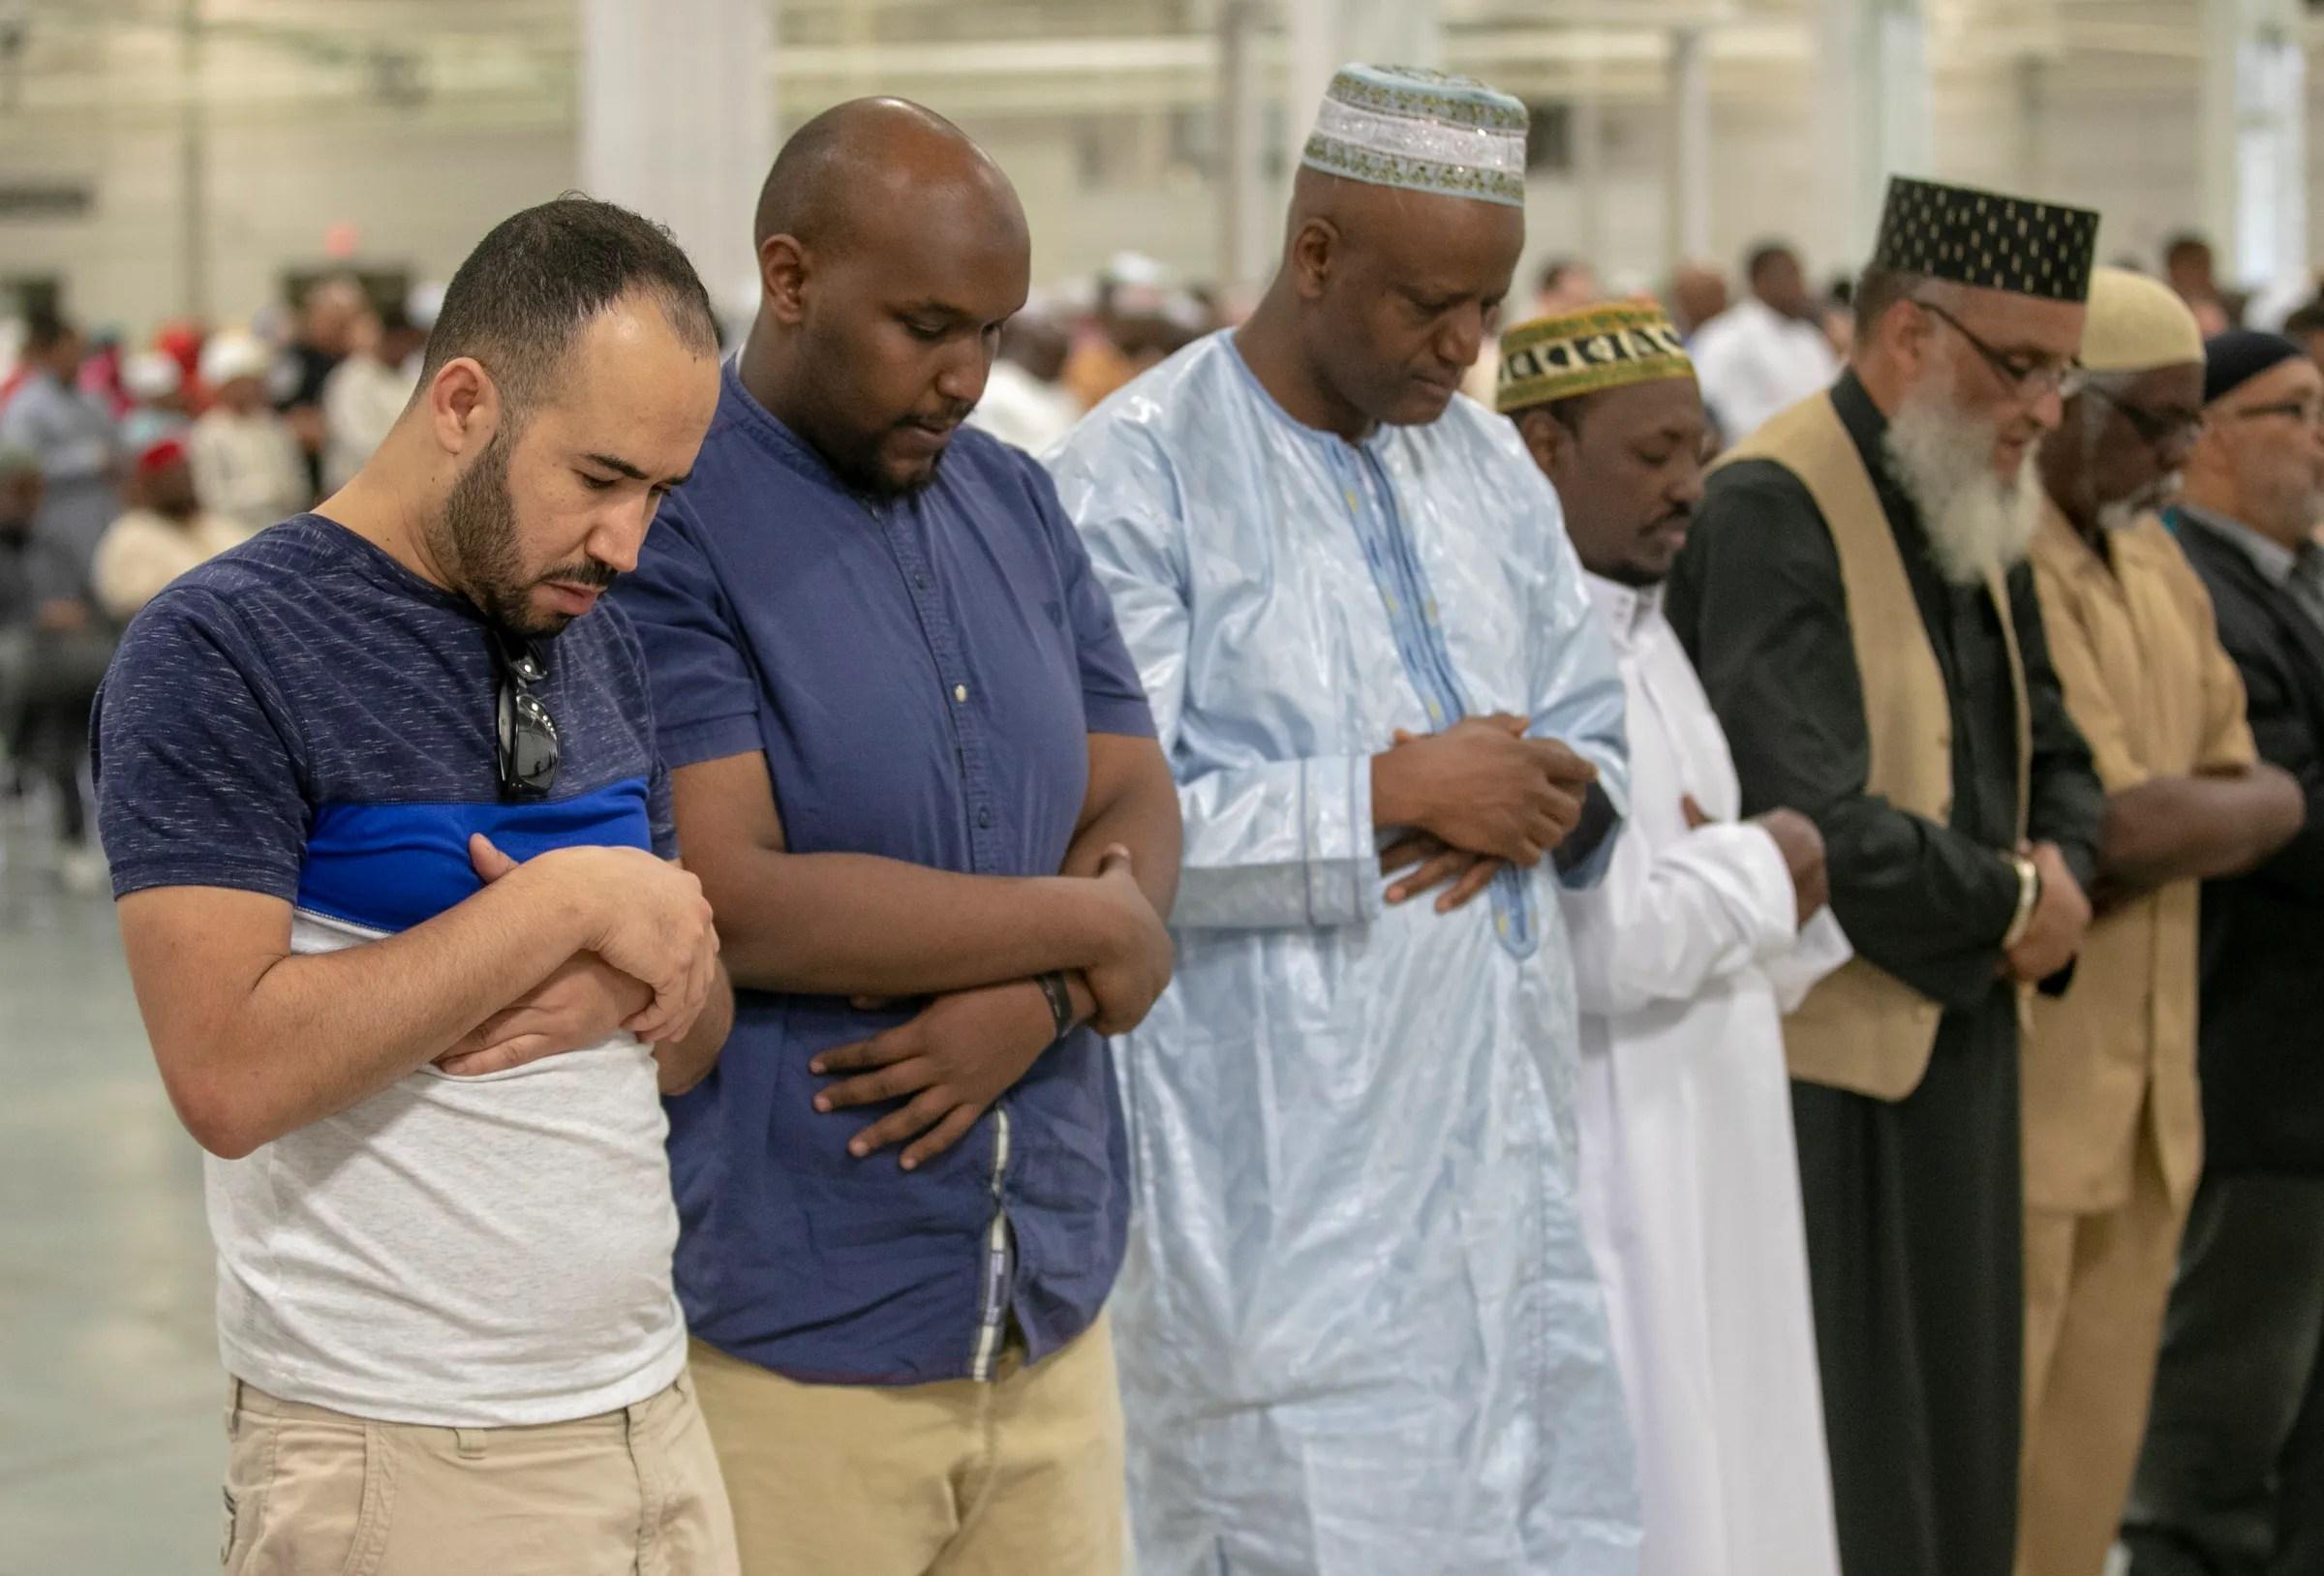 Indianapolis Muslims Celebrate Eid Al Fitr The End Of Ramadan